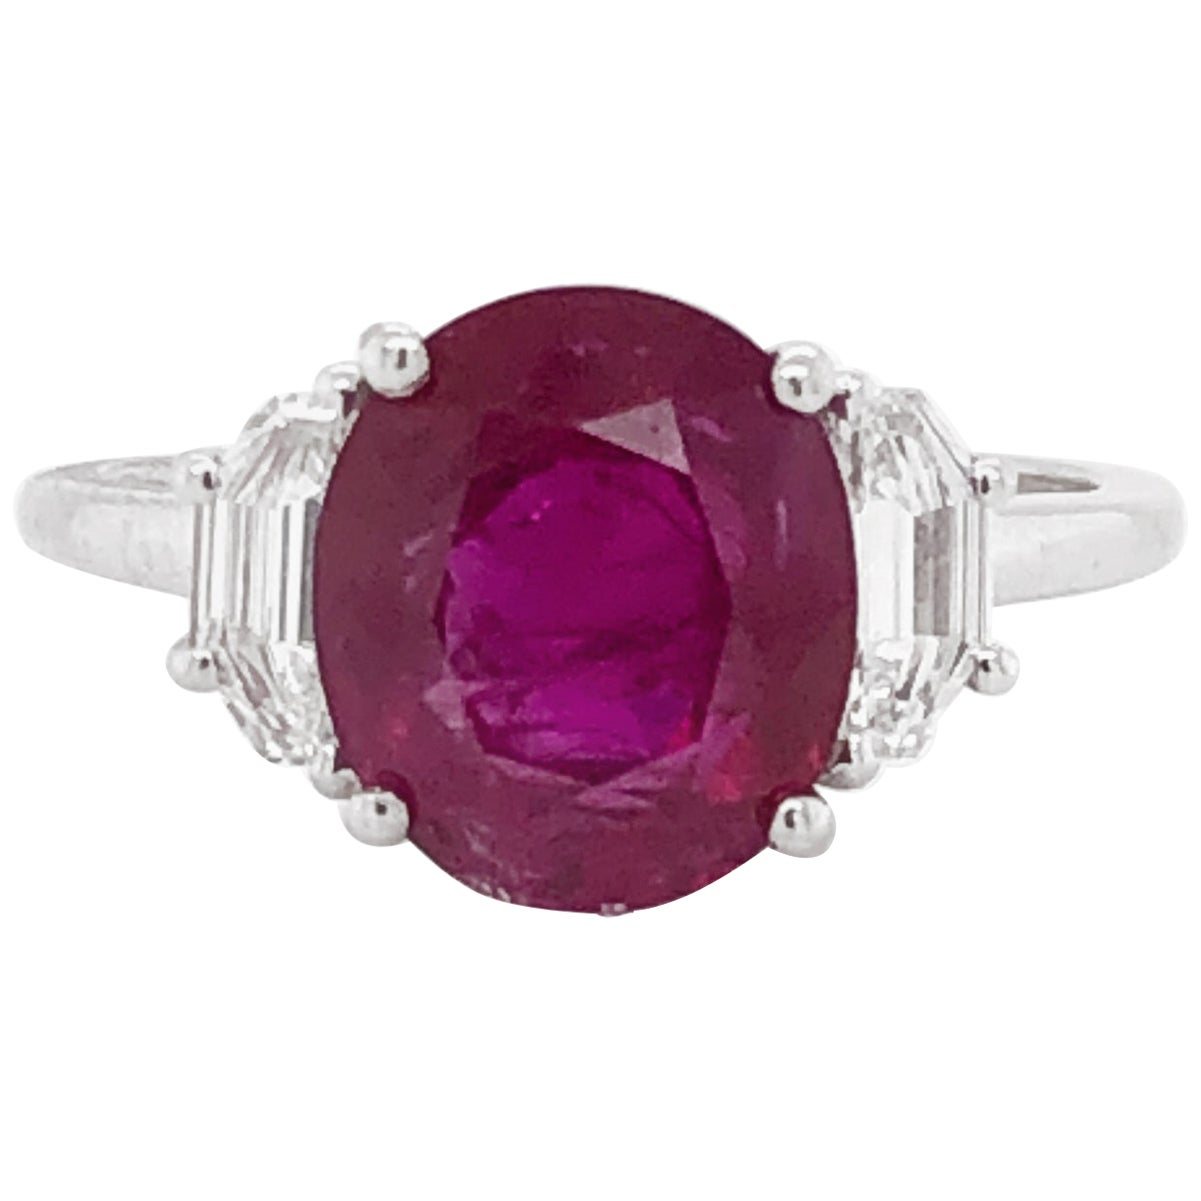 Certified Oval Cut Burmese Ruby 3.69 Carat and Diamond 0.40 Carat Platinum Ring